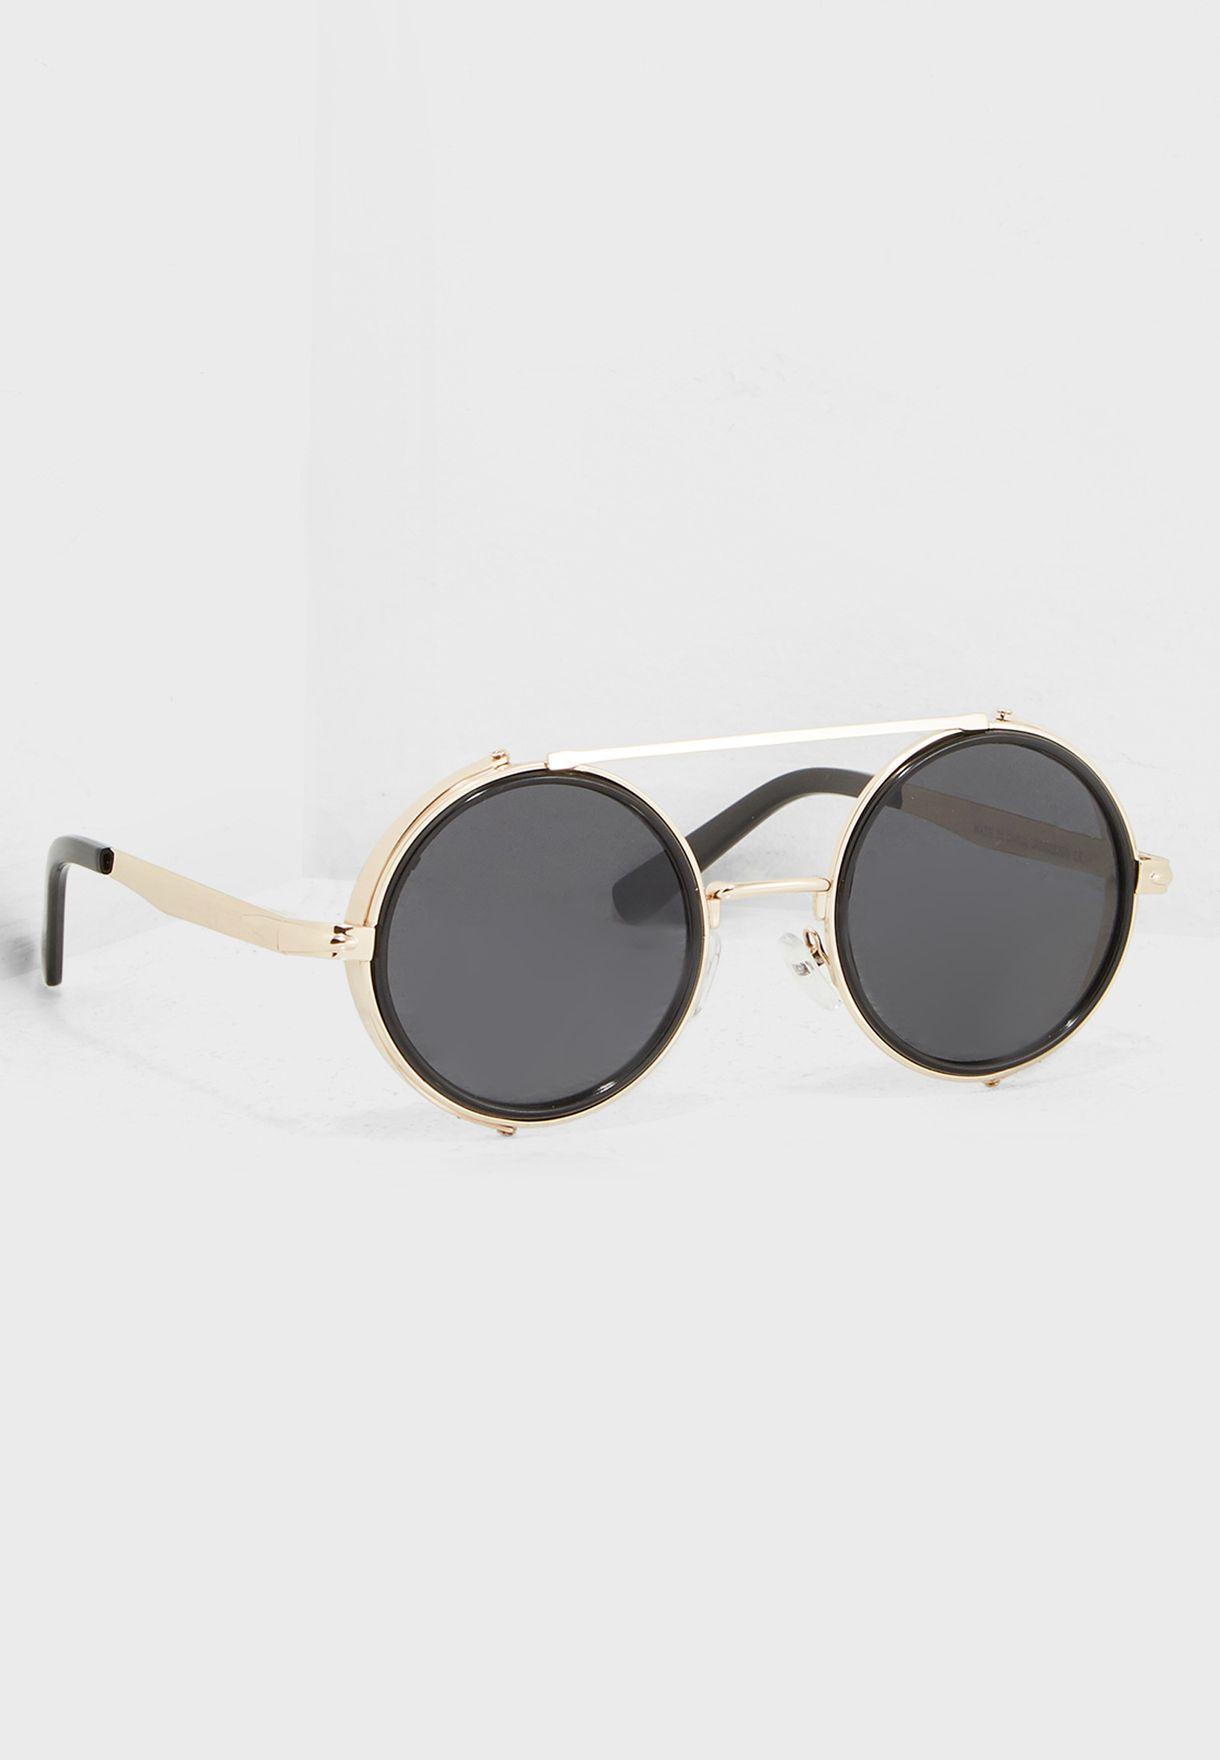 4e22e80f8a502 Shop Seventy five gold Steampunk Vintage Round Sunglasses TNS1818 ...